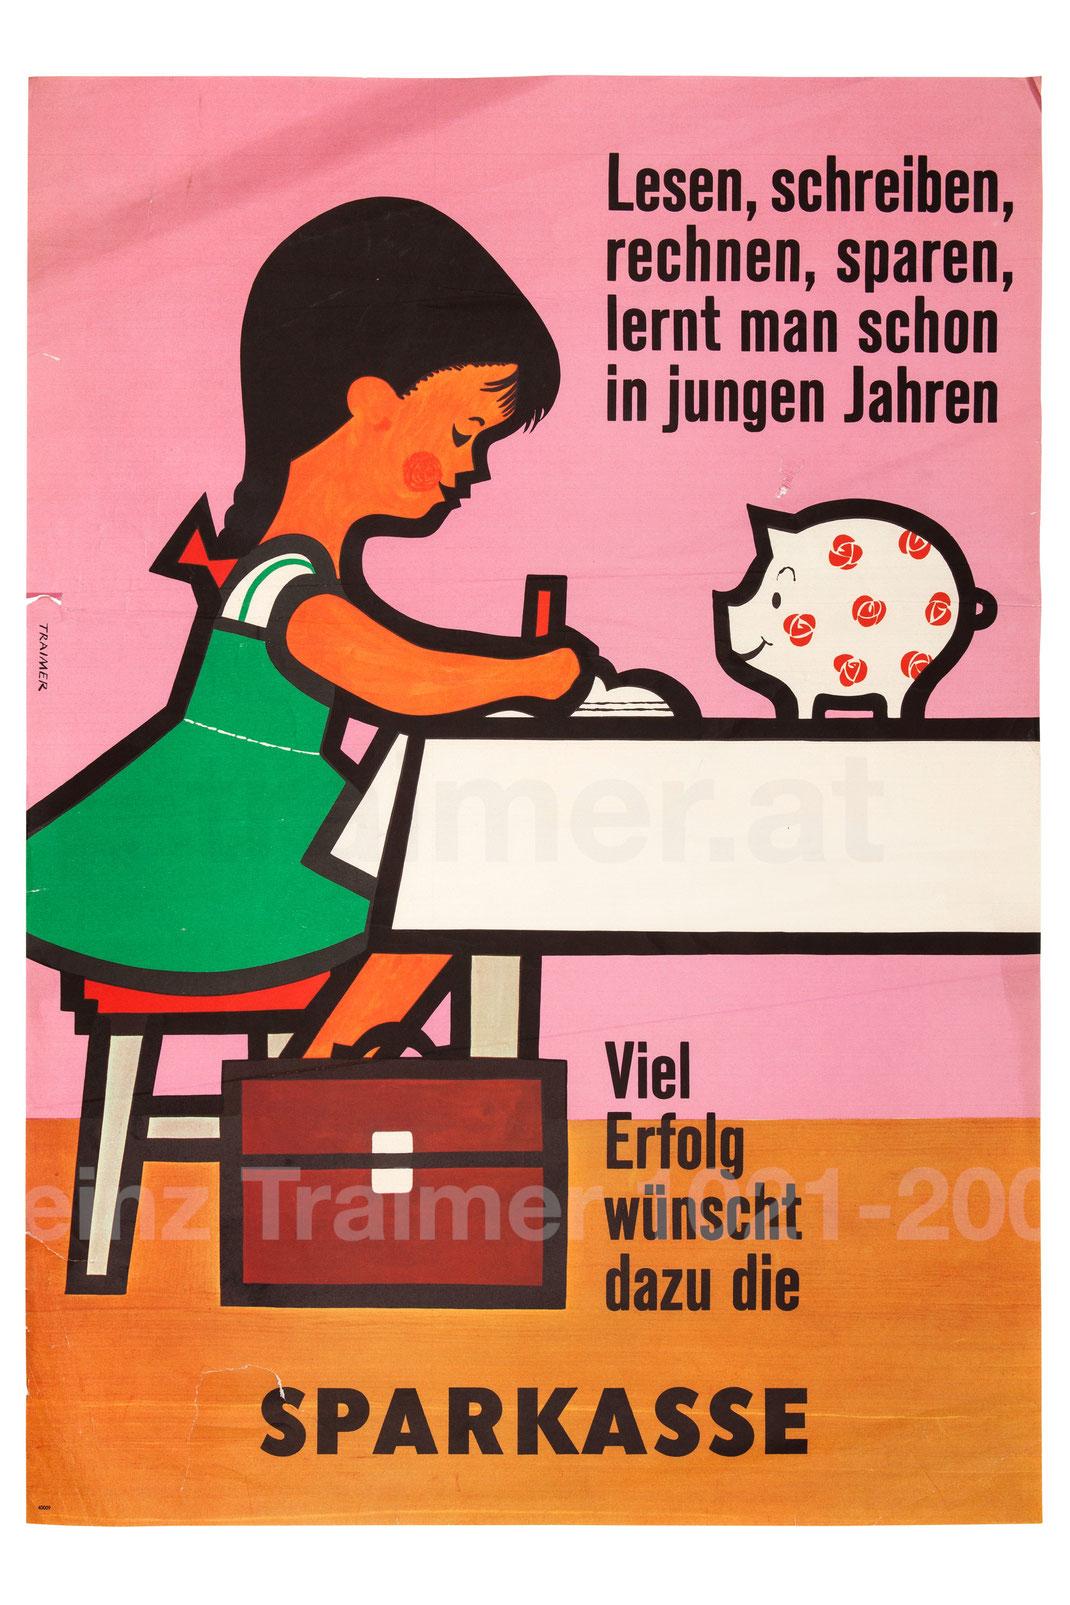 Vorsorge Werbung Sparkasse um 1965 (Sammlung Traimer / Foto: Peter Hoiß)